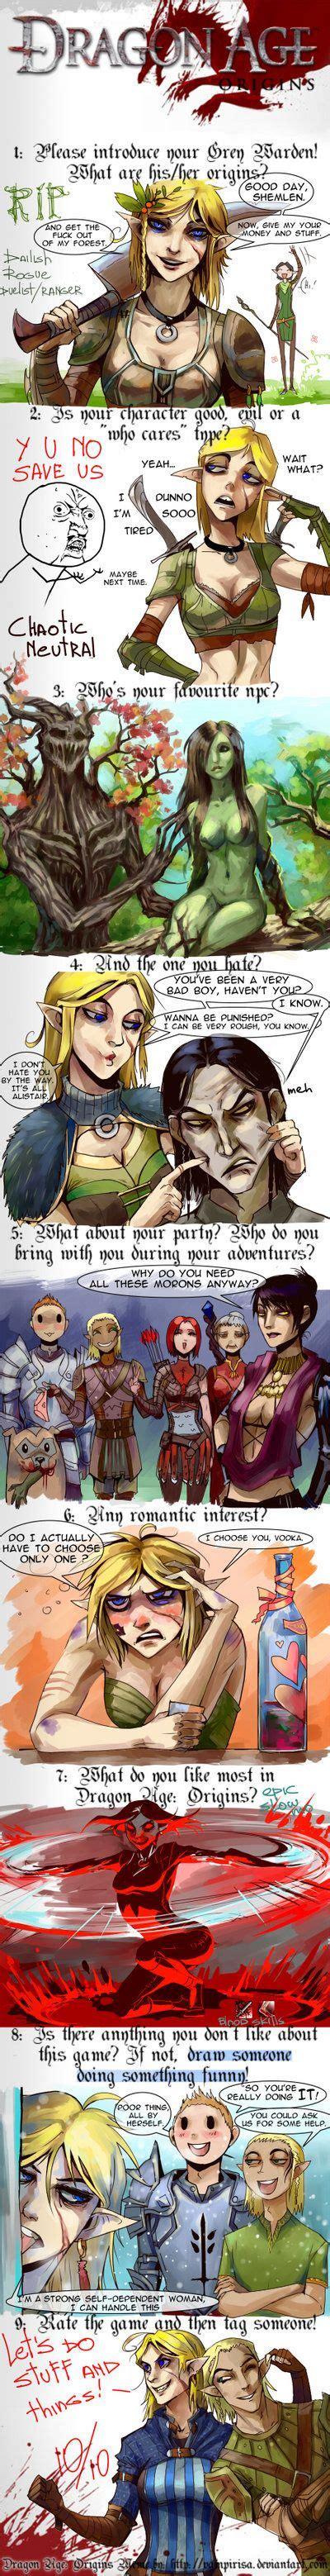 dragon age origins meme by nanoetetsu deviantart com on